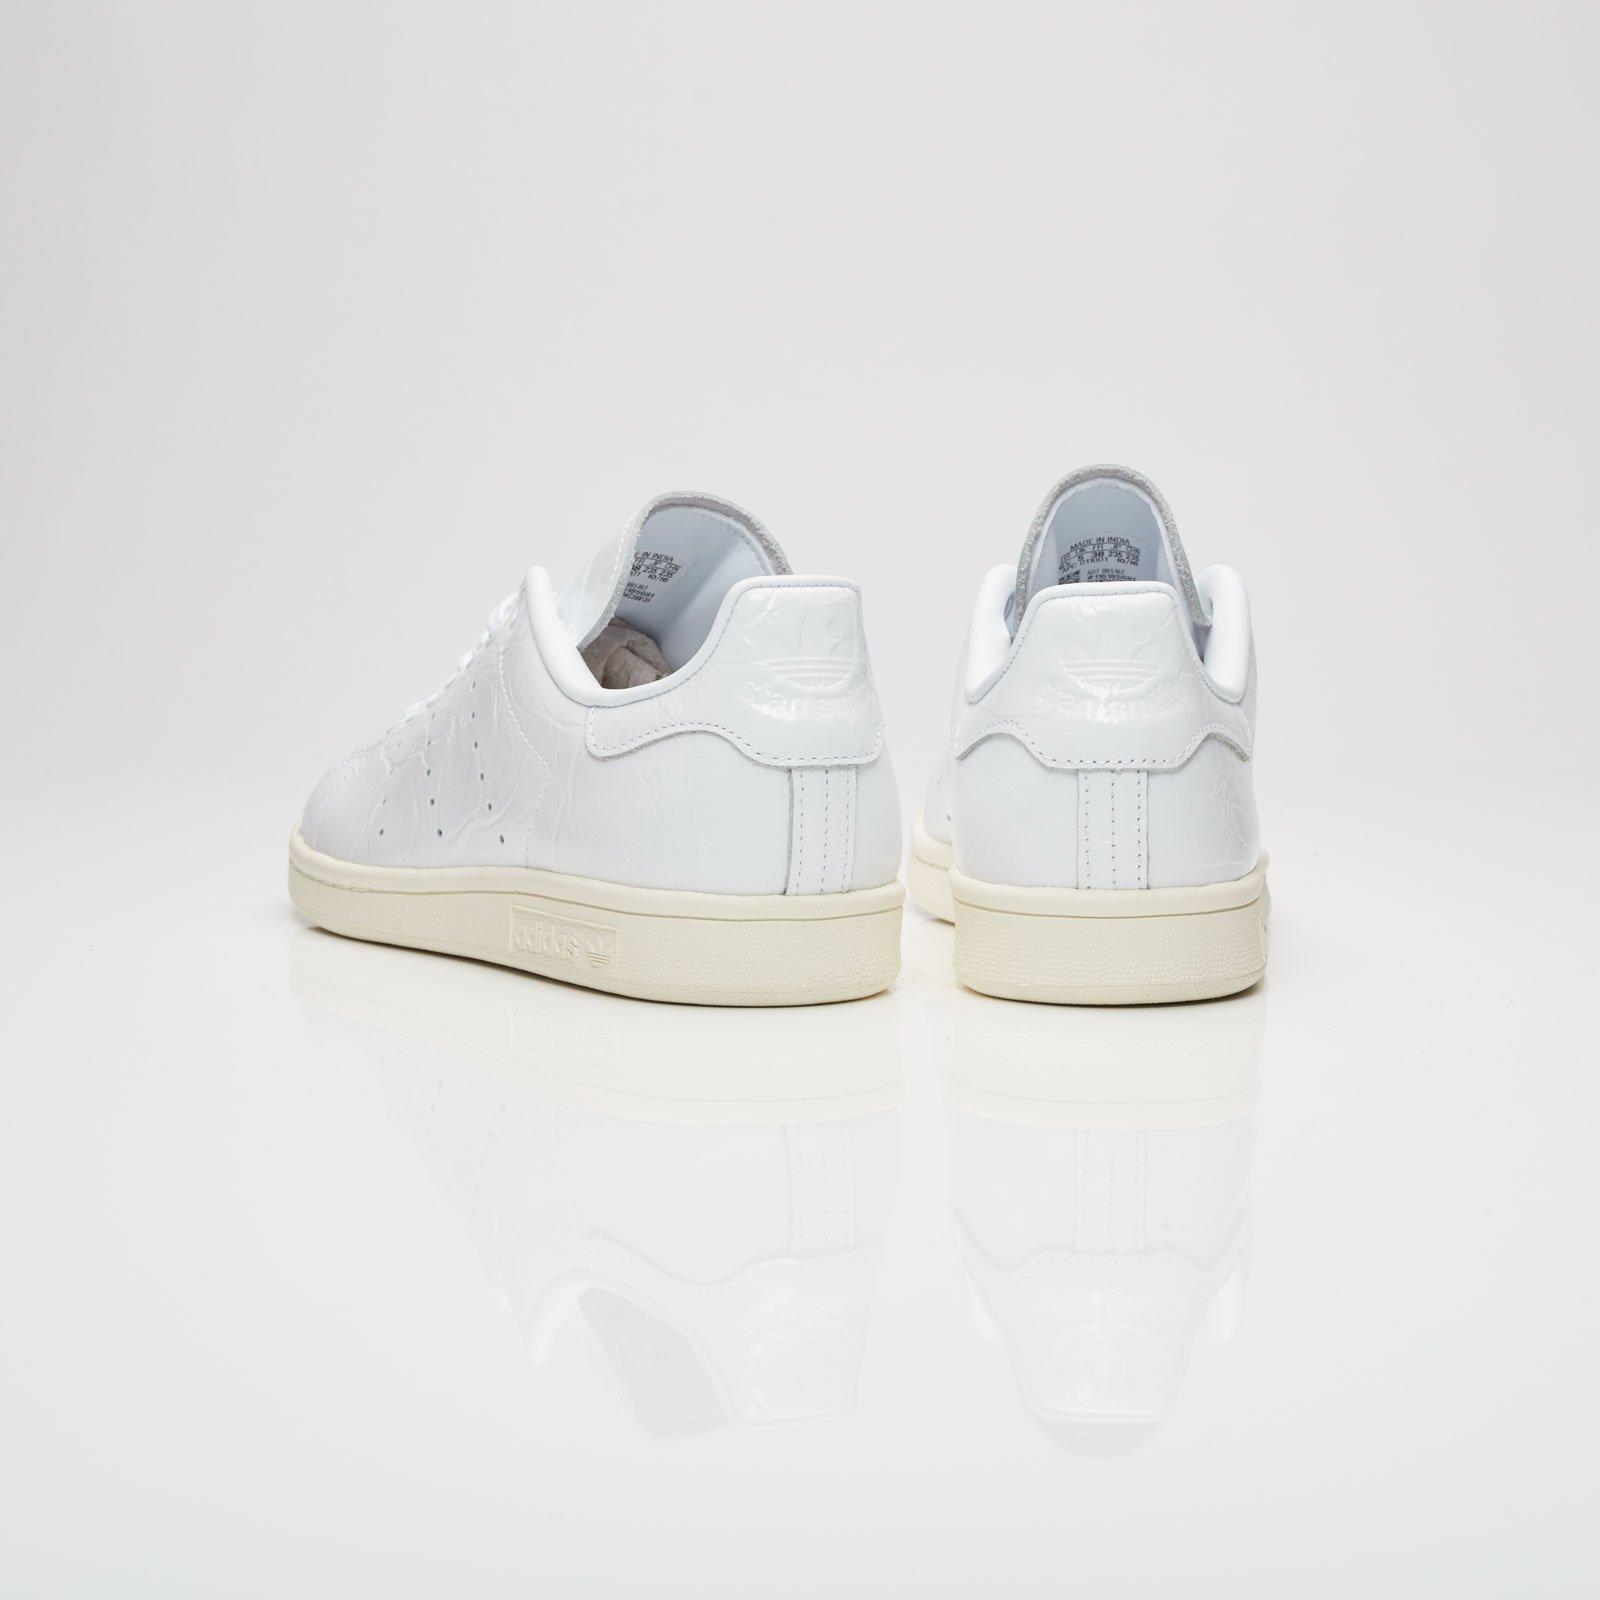 Adidas Stan Smith, W Bb5162 Scarpe da Ginnasticanstuff Scarpe